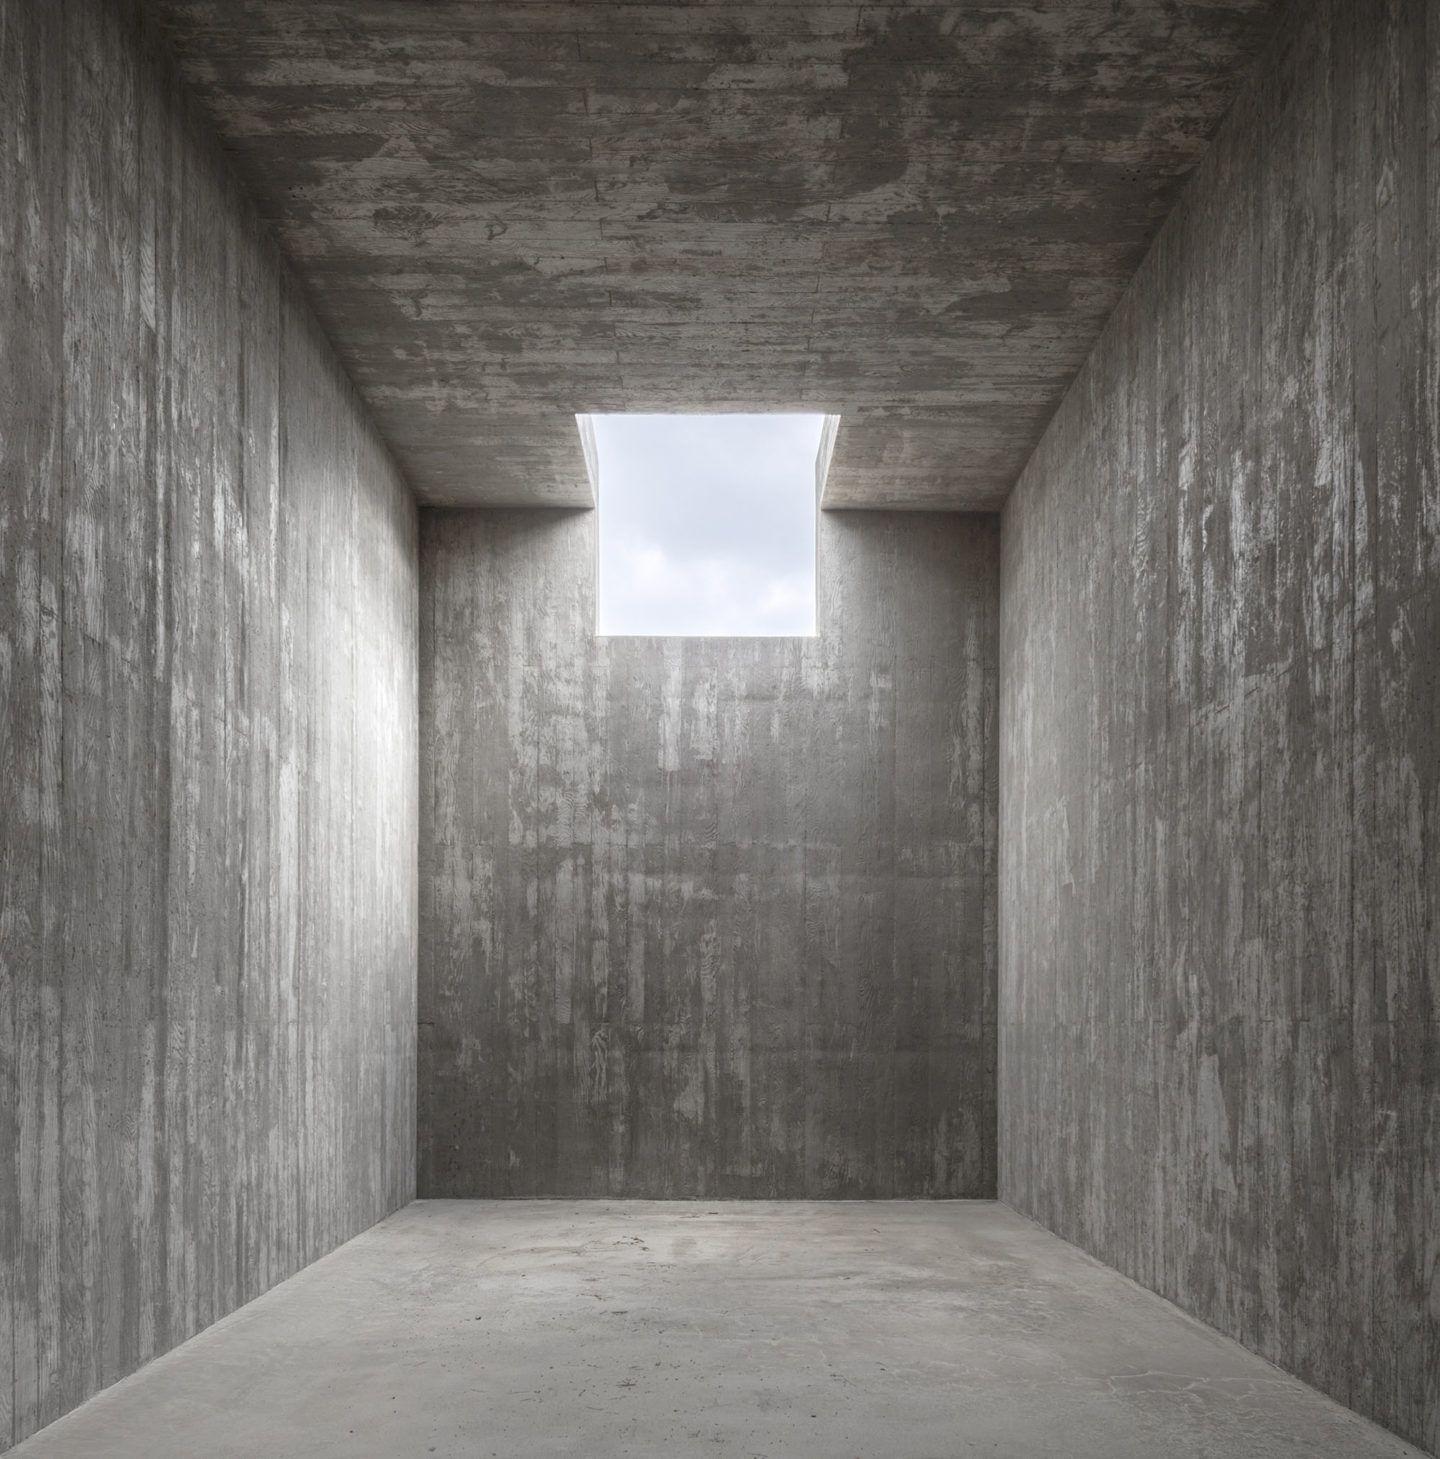 IGNANT-Architecture-Alvaro-Siza-Carlos-Castanheira-Art-Pavilion-Photographs-21